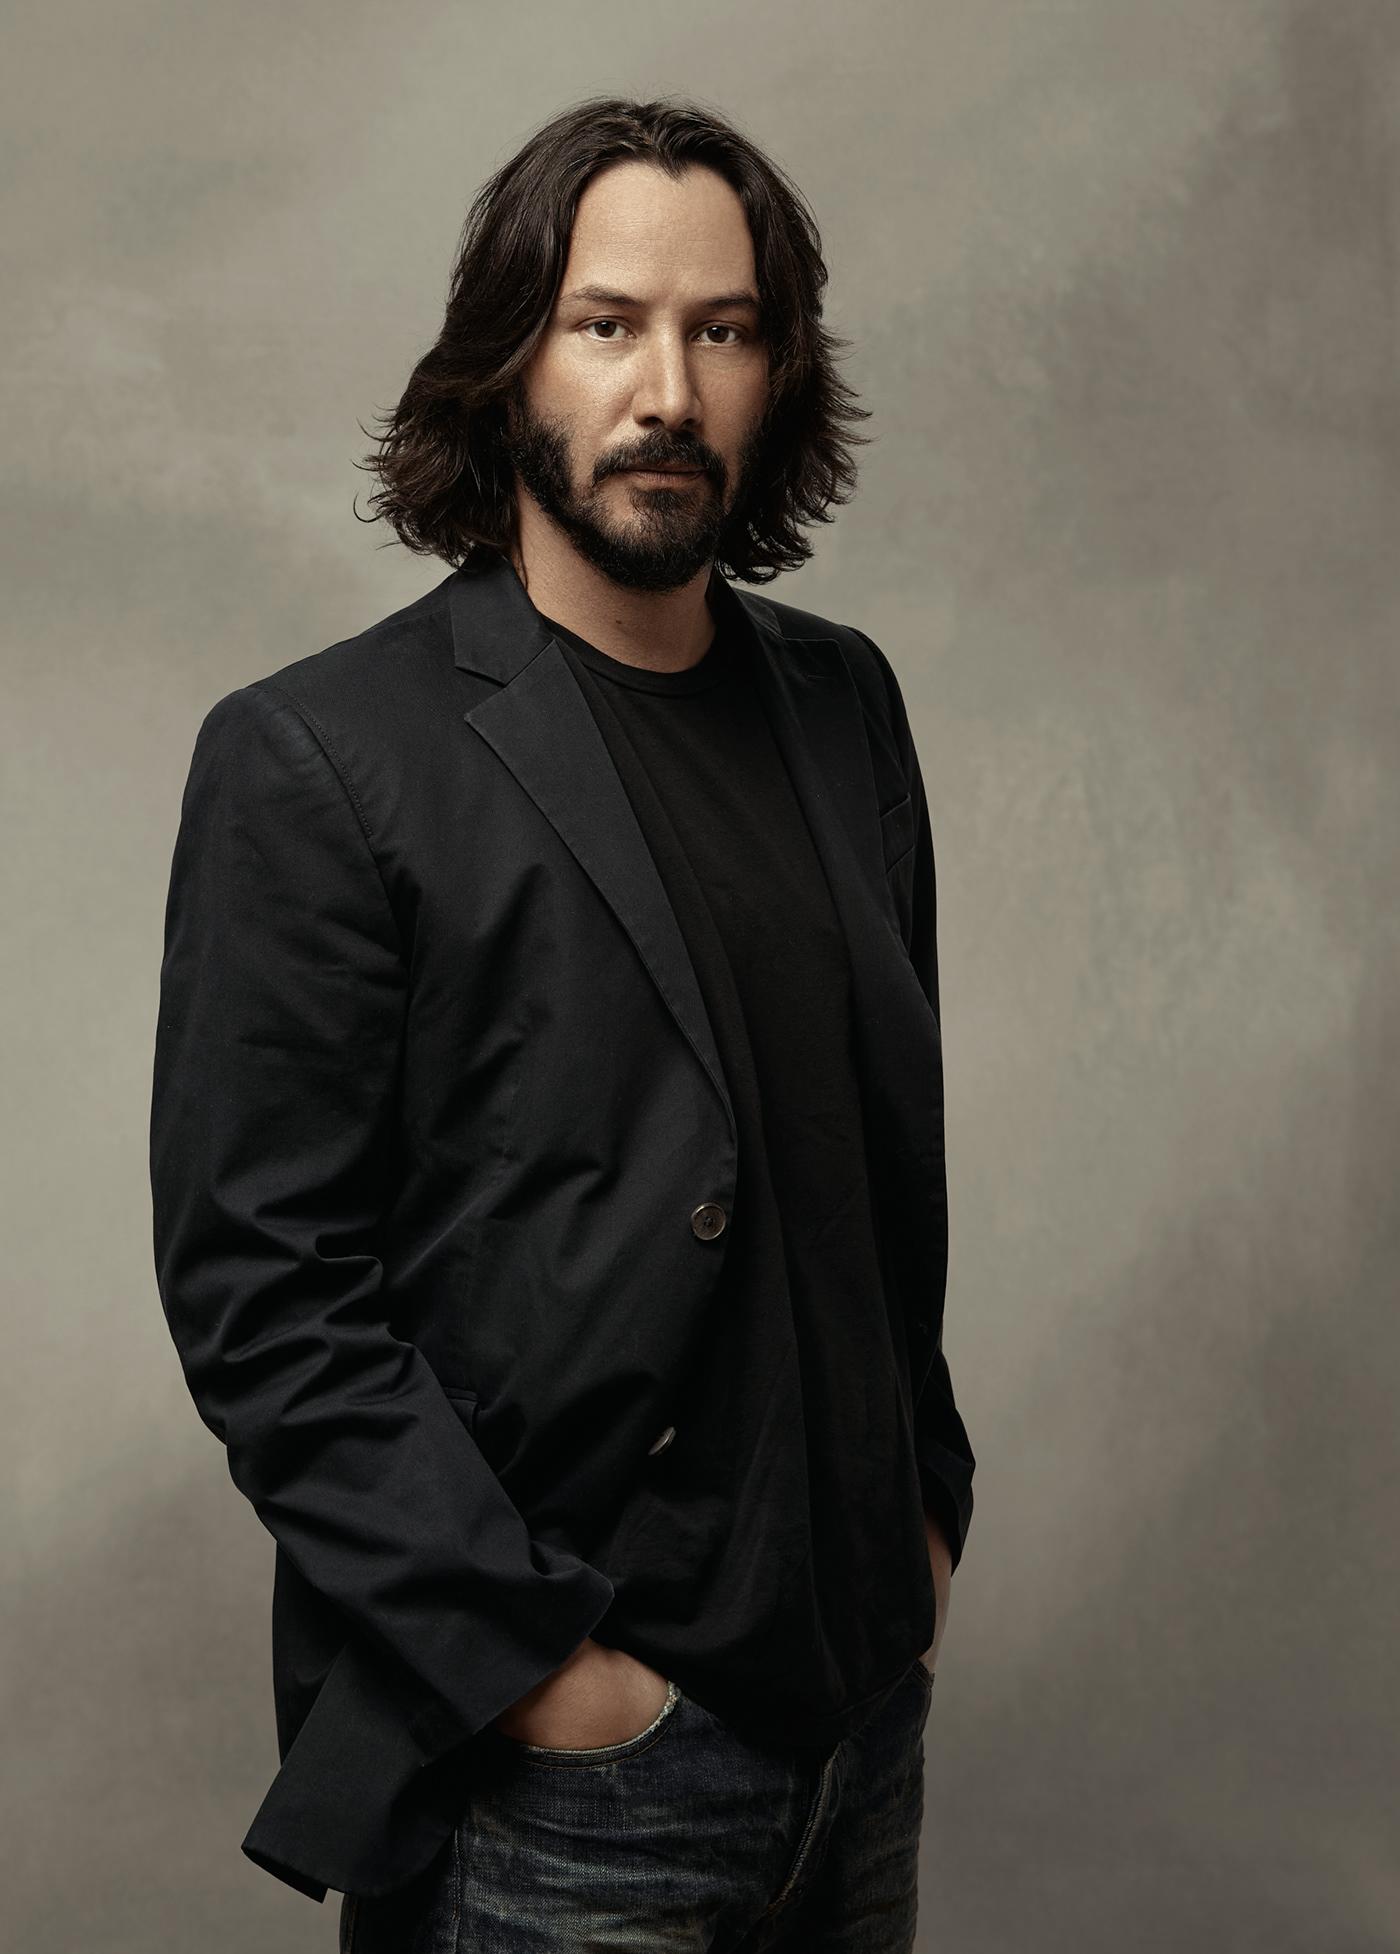 Celebrity cinematic color grading creative lighting Creative Retouching high end retouching hollywood Oscars portrait photography